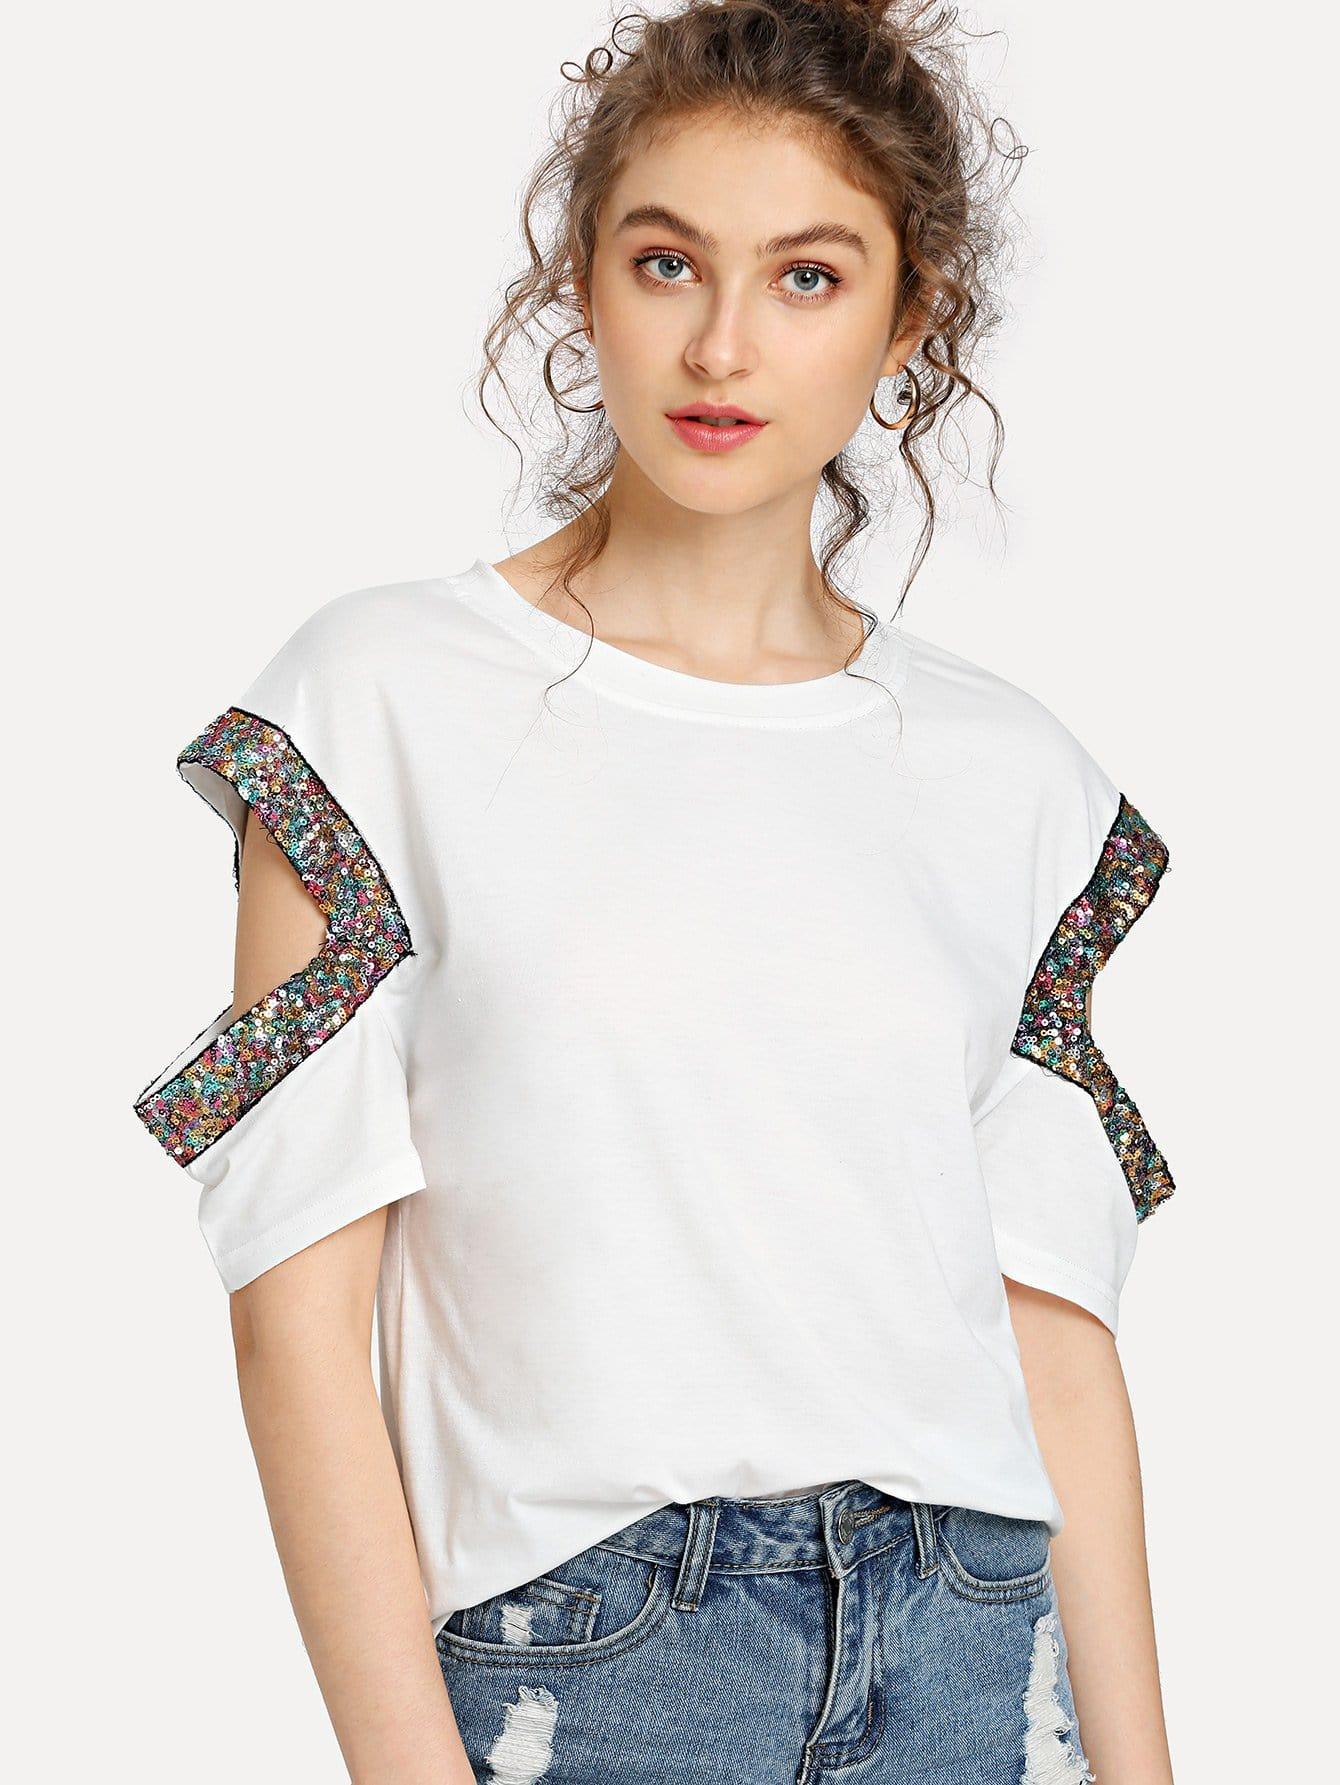 Sequin Detail Cutout Sleeve T-shirt odeon light 2879 4c odl16 015 бронзовый хрусталь люстра потолочная e14 4 60w 220v gardia